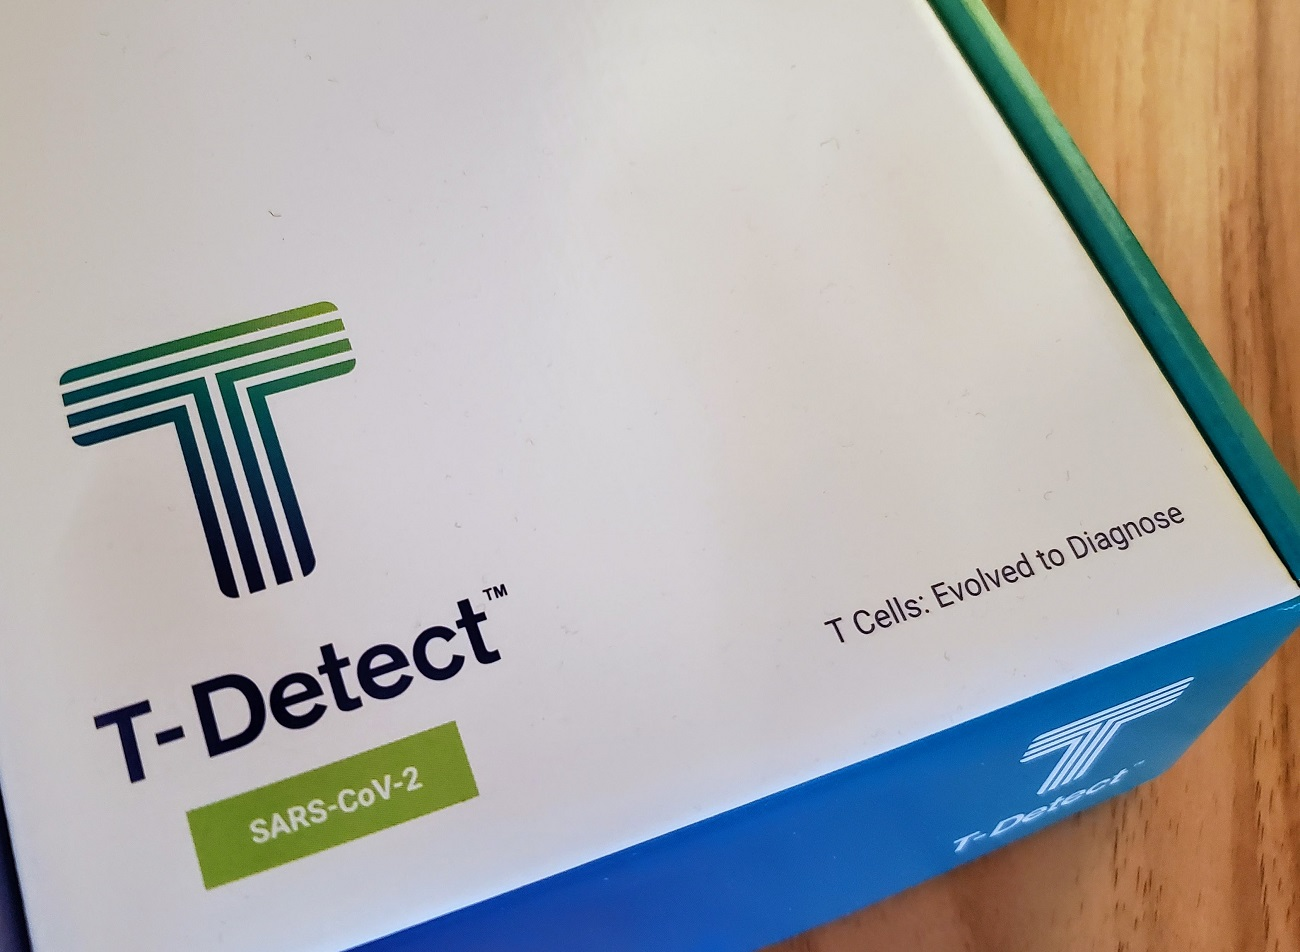 t-detect